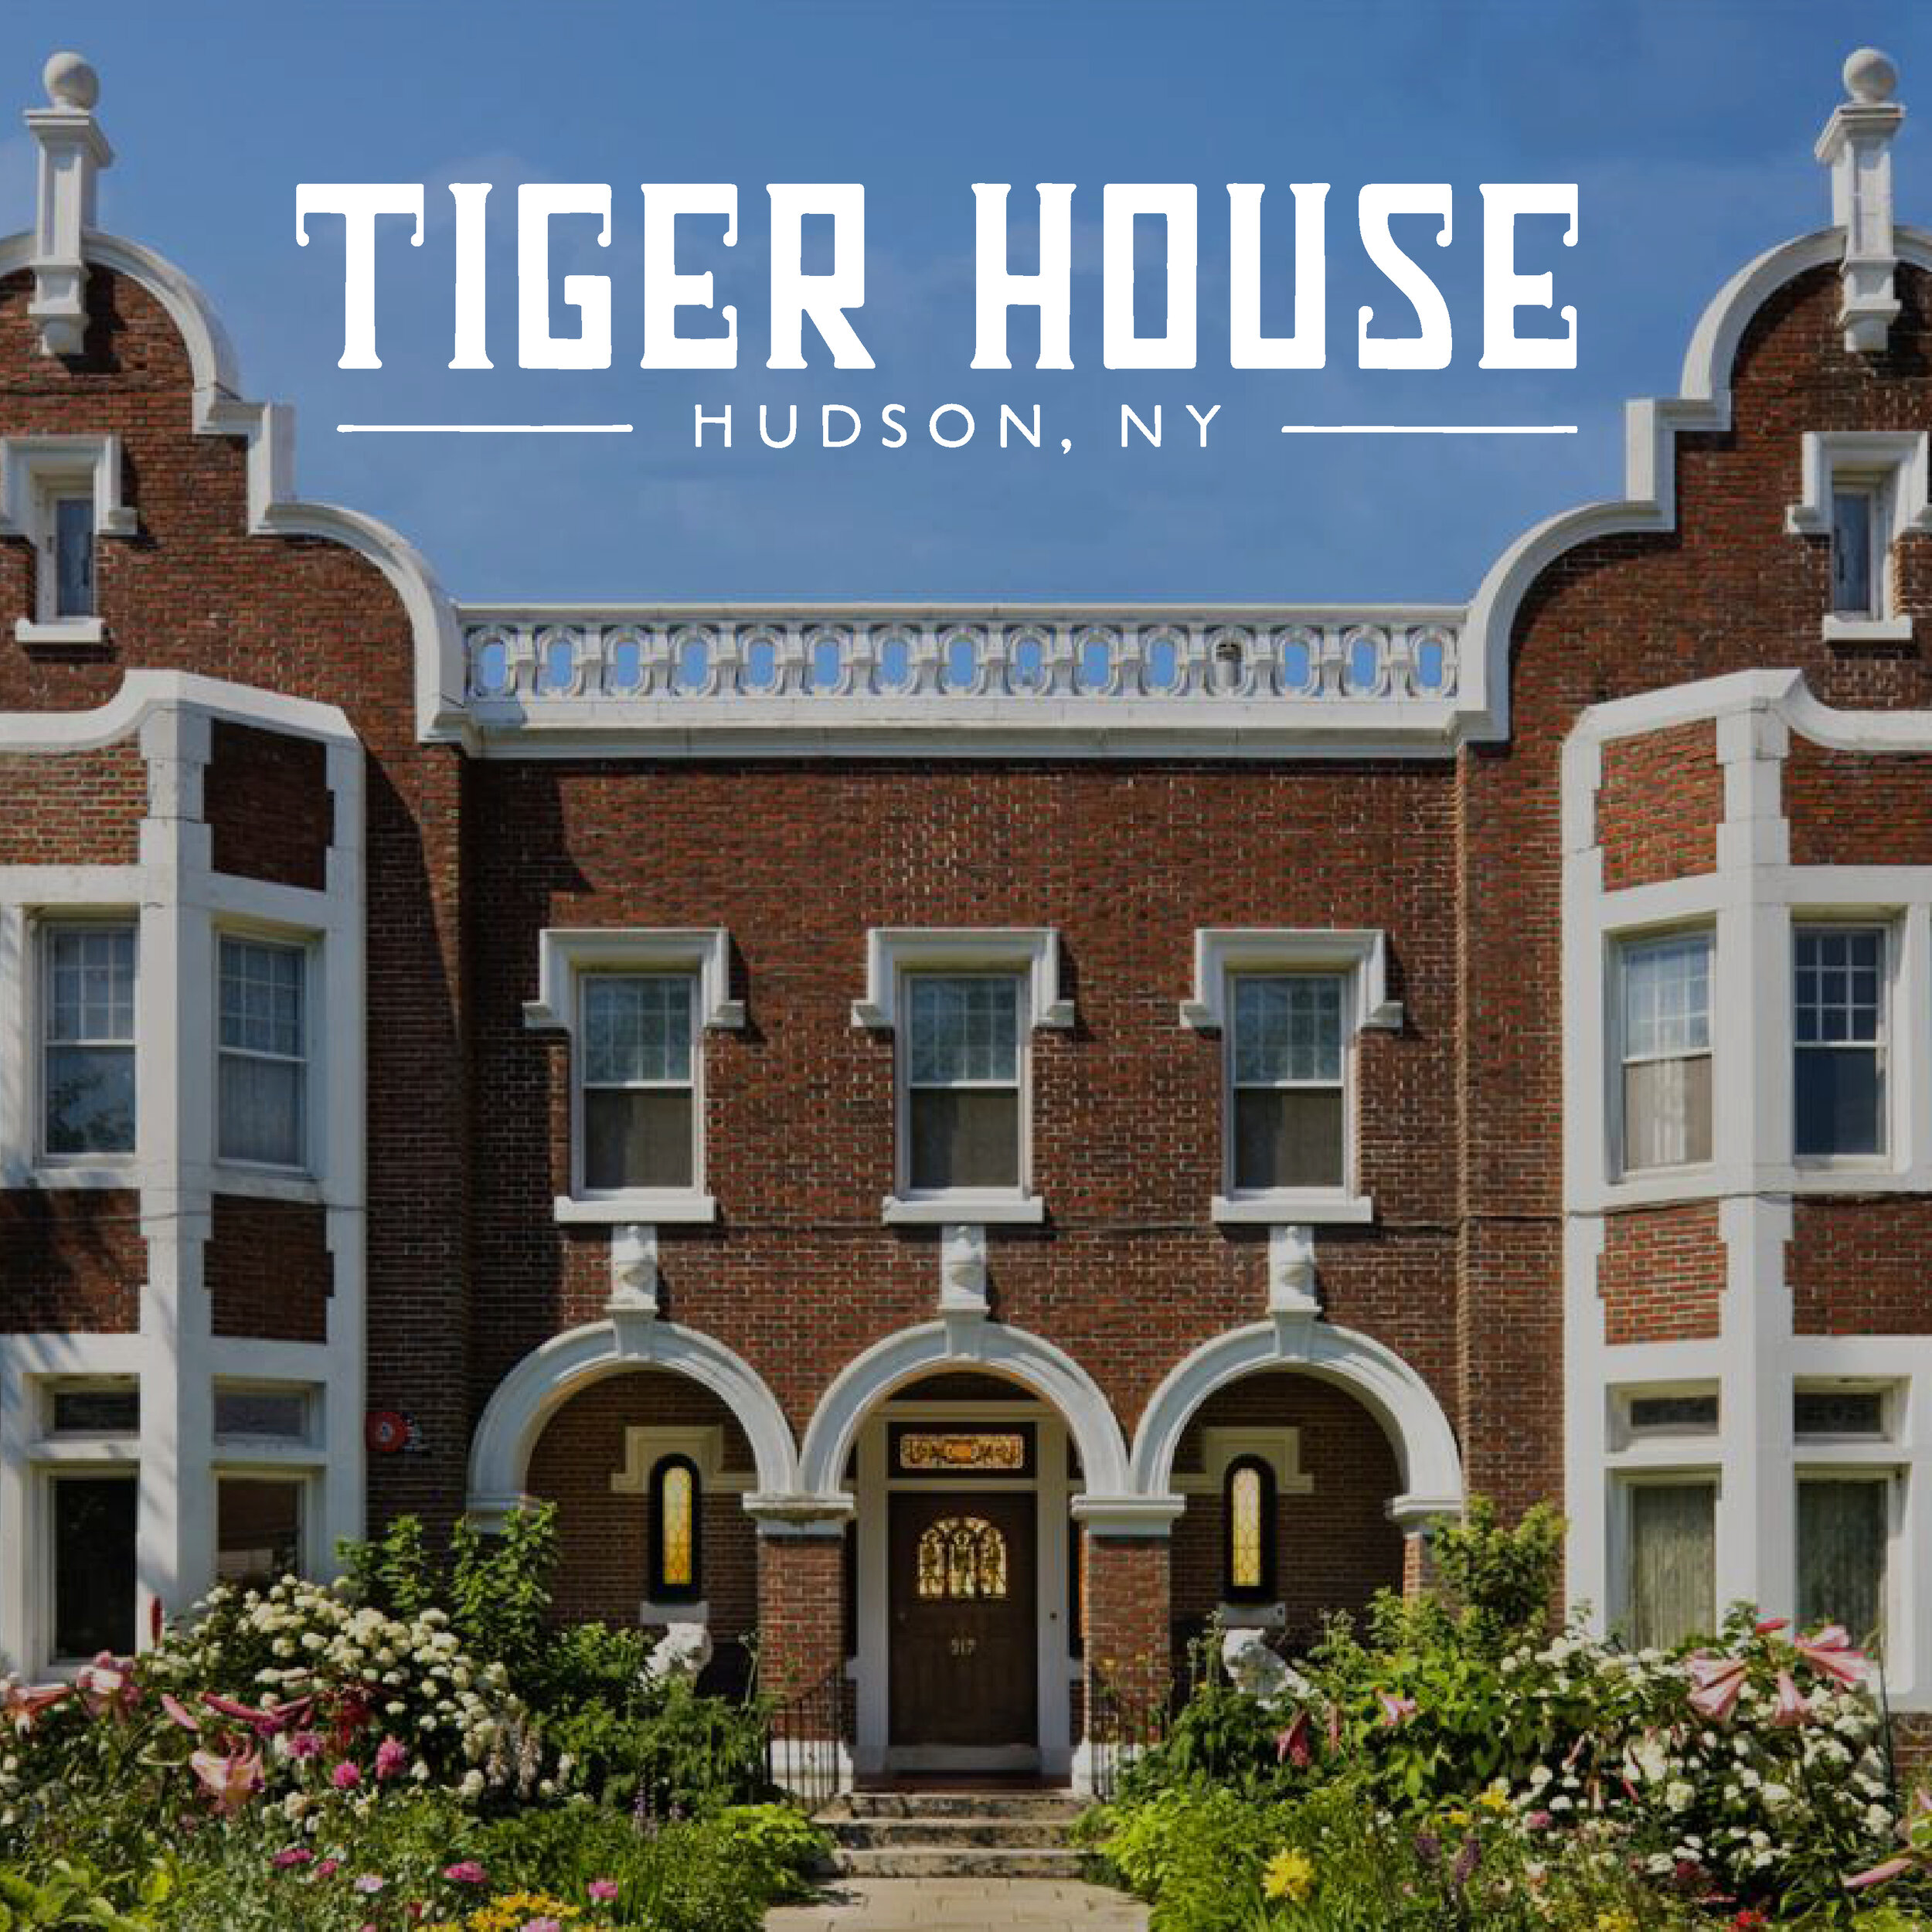 square graphics - 2019 Tiger house3.jpg